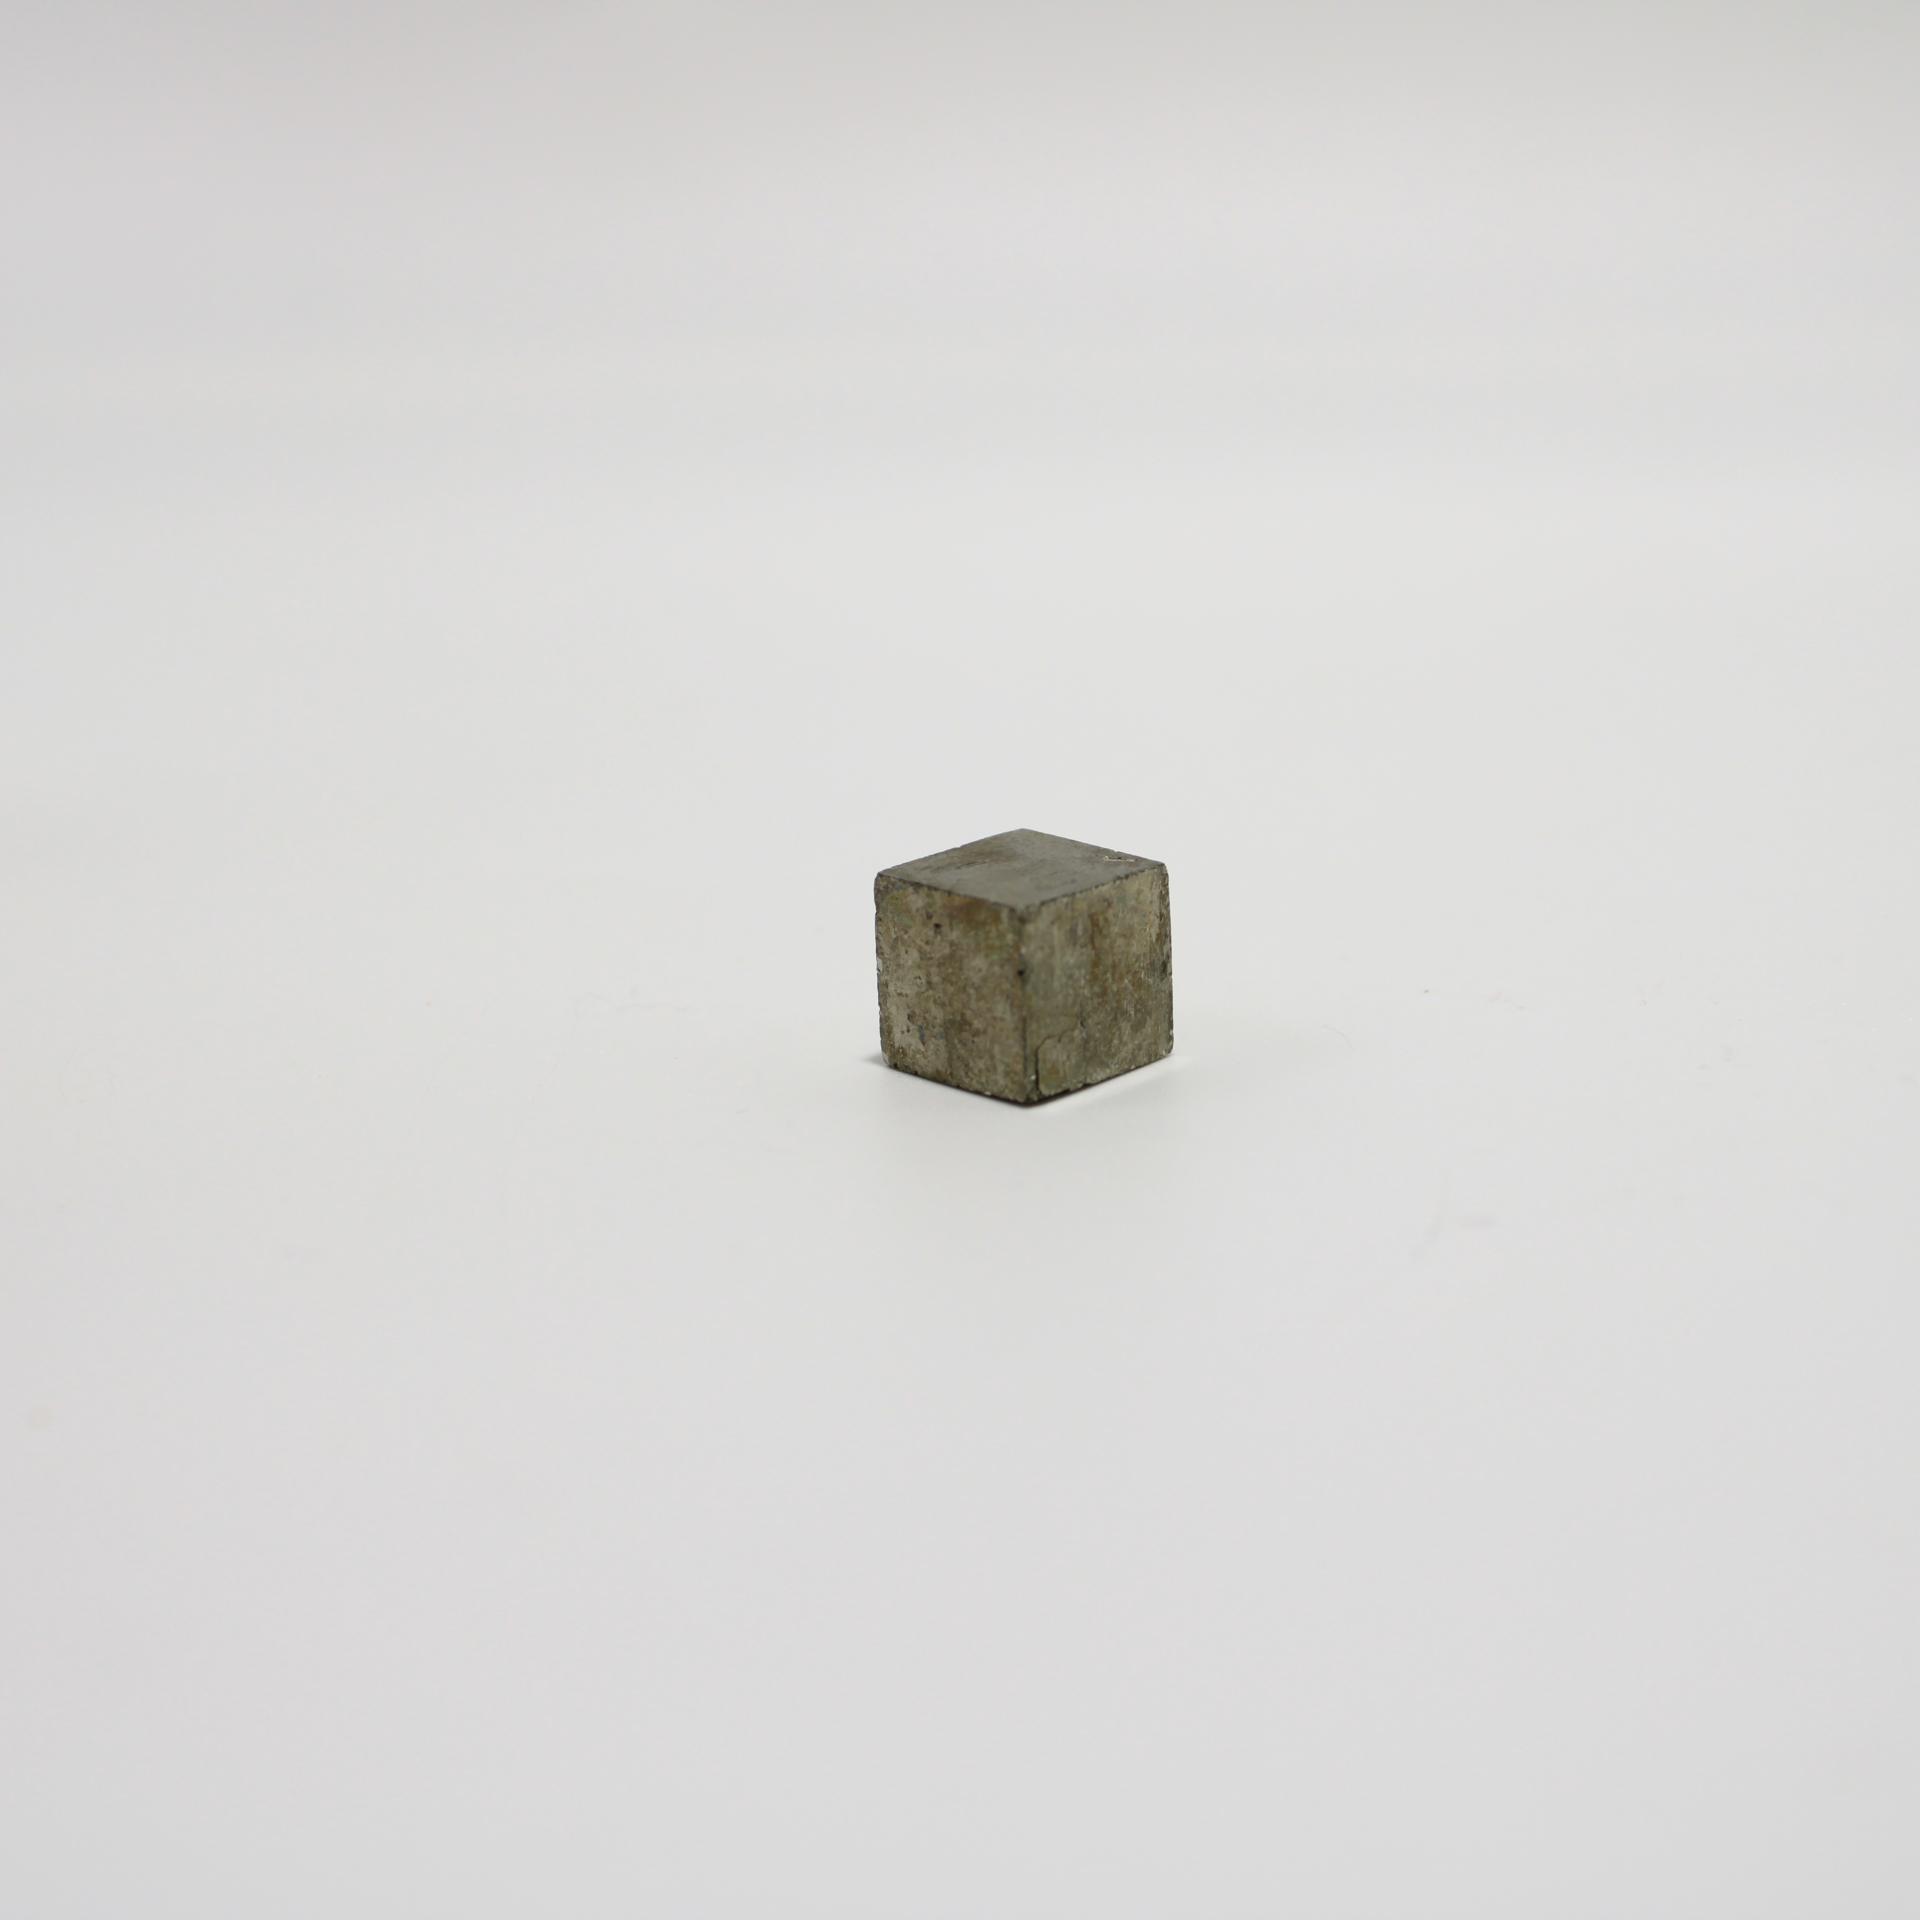 I74 pyritecube 4